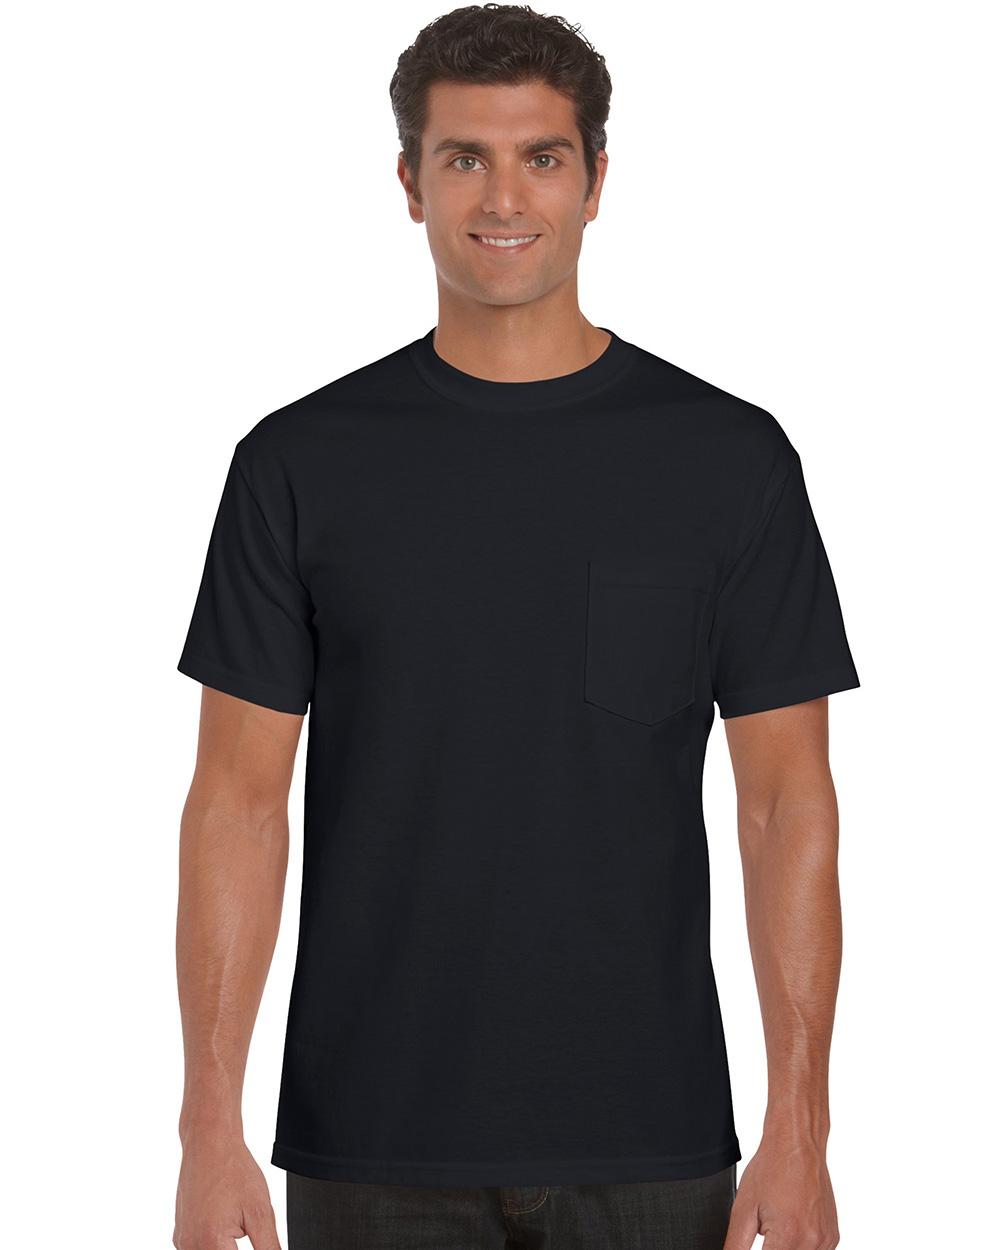 Gildan 2300     Ultra Cotton™    Classic Fit Adult Pocket T-Shirt    6.0 oz. 100% Cotton